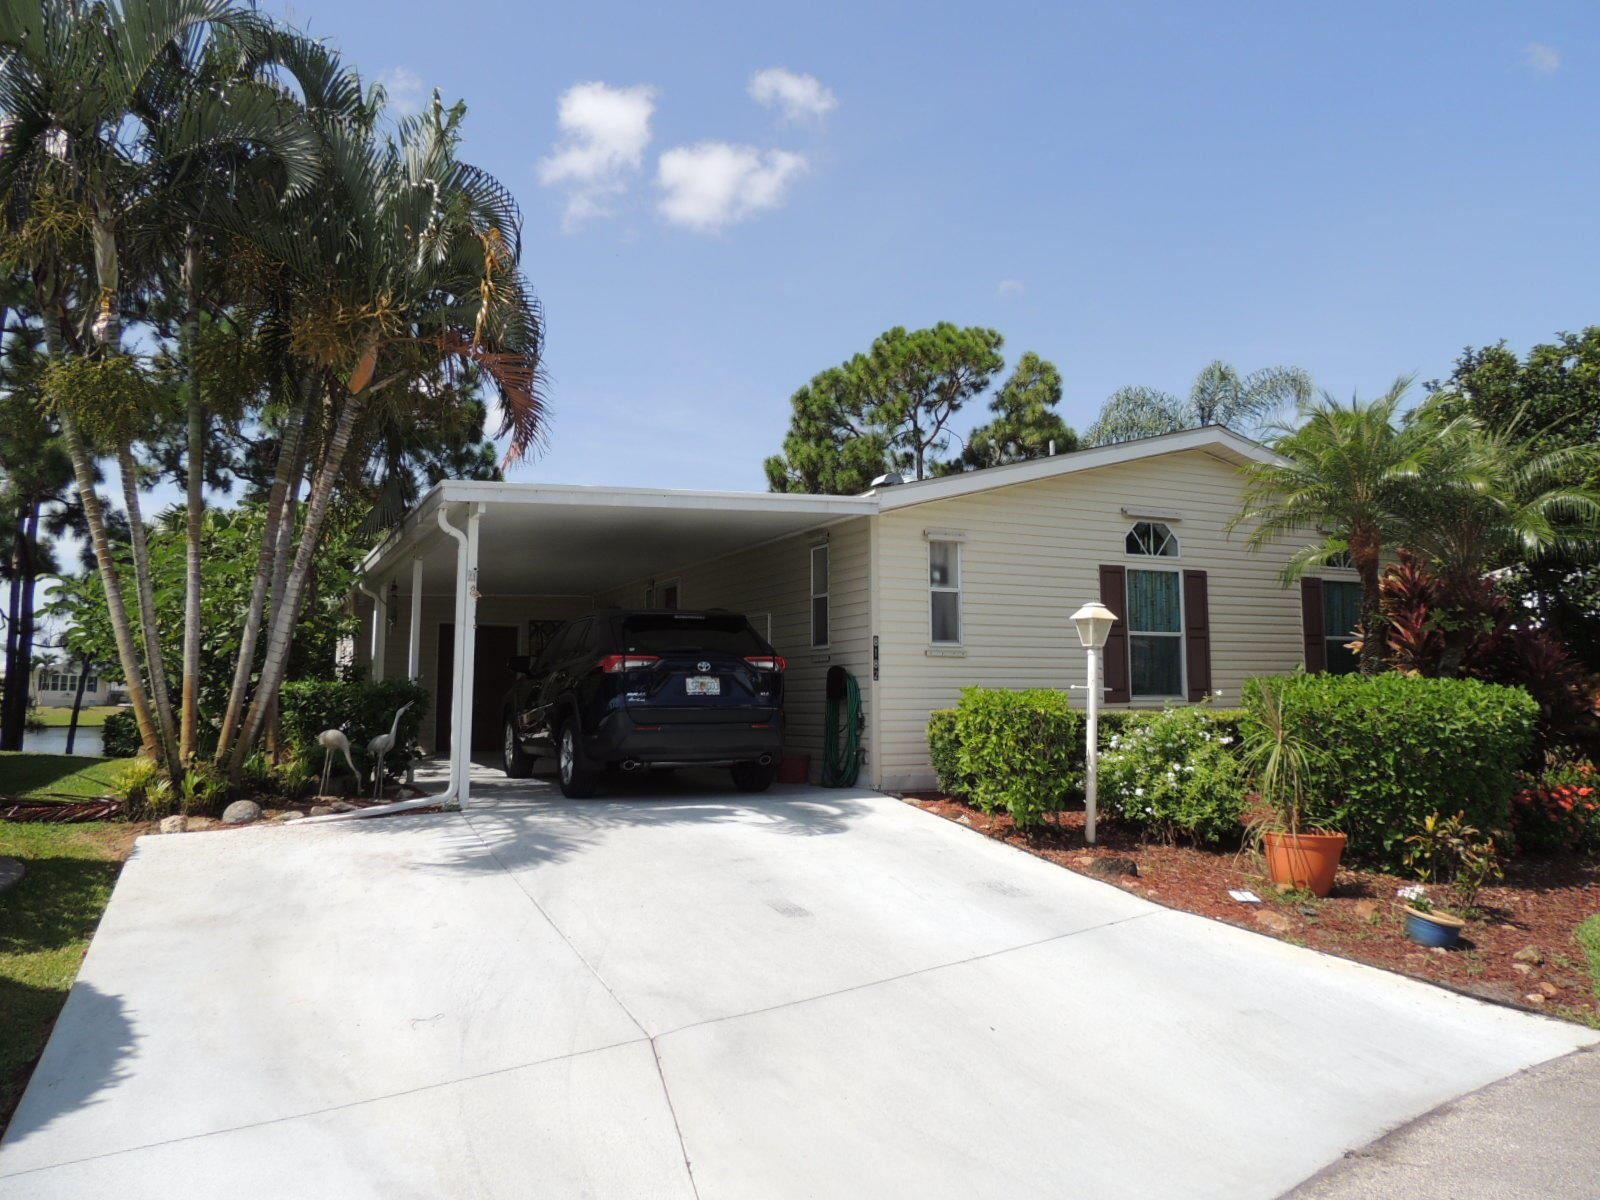 8182 14th Hole Drive, Port Saint Lucie, FL 34952 - #: RX-10625864